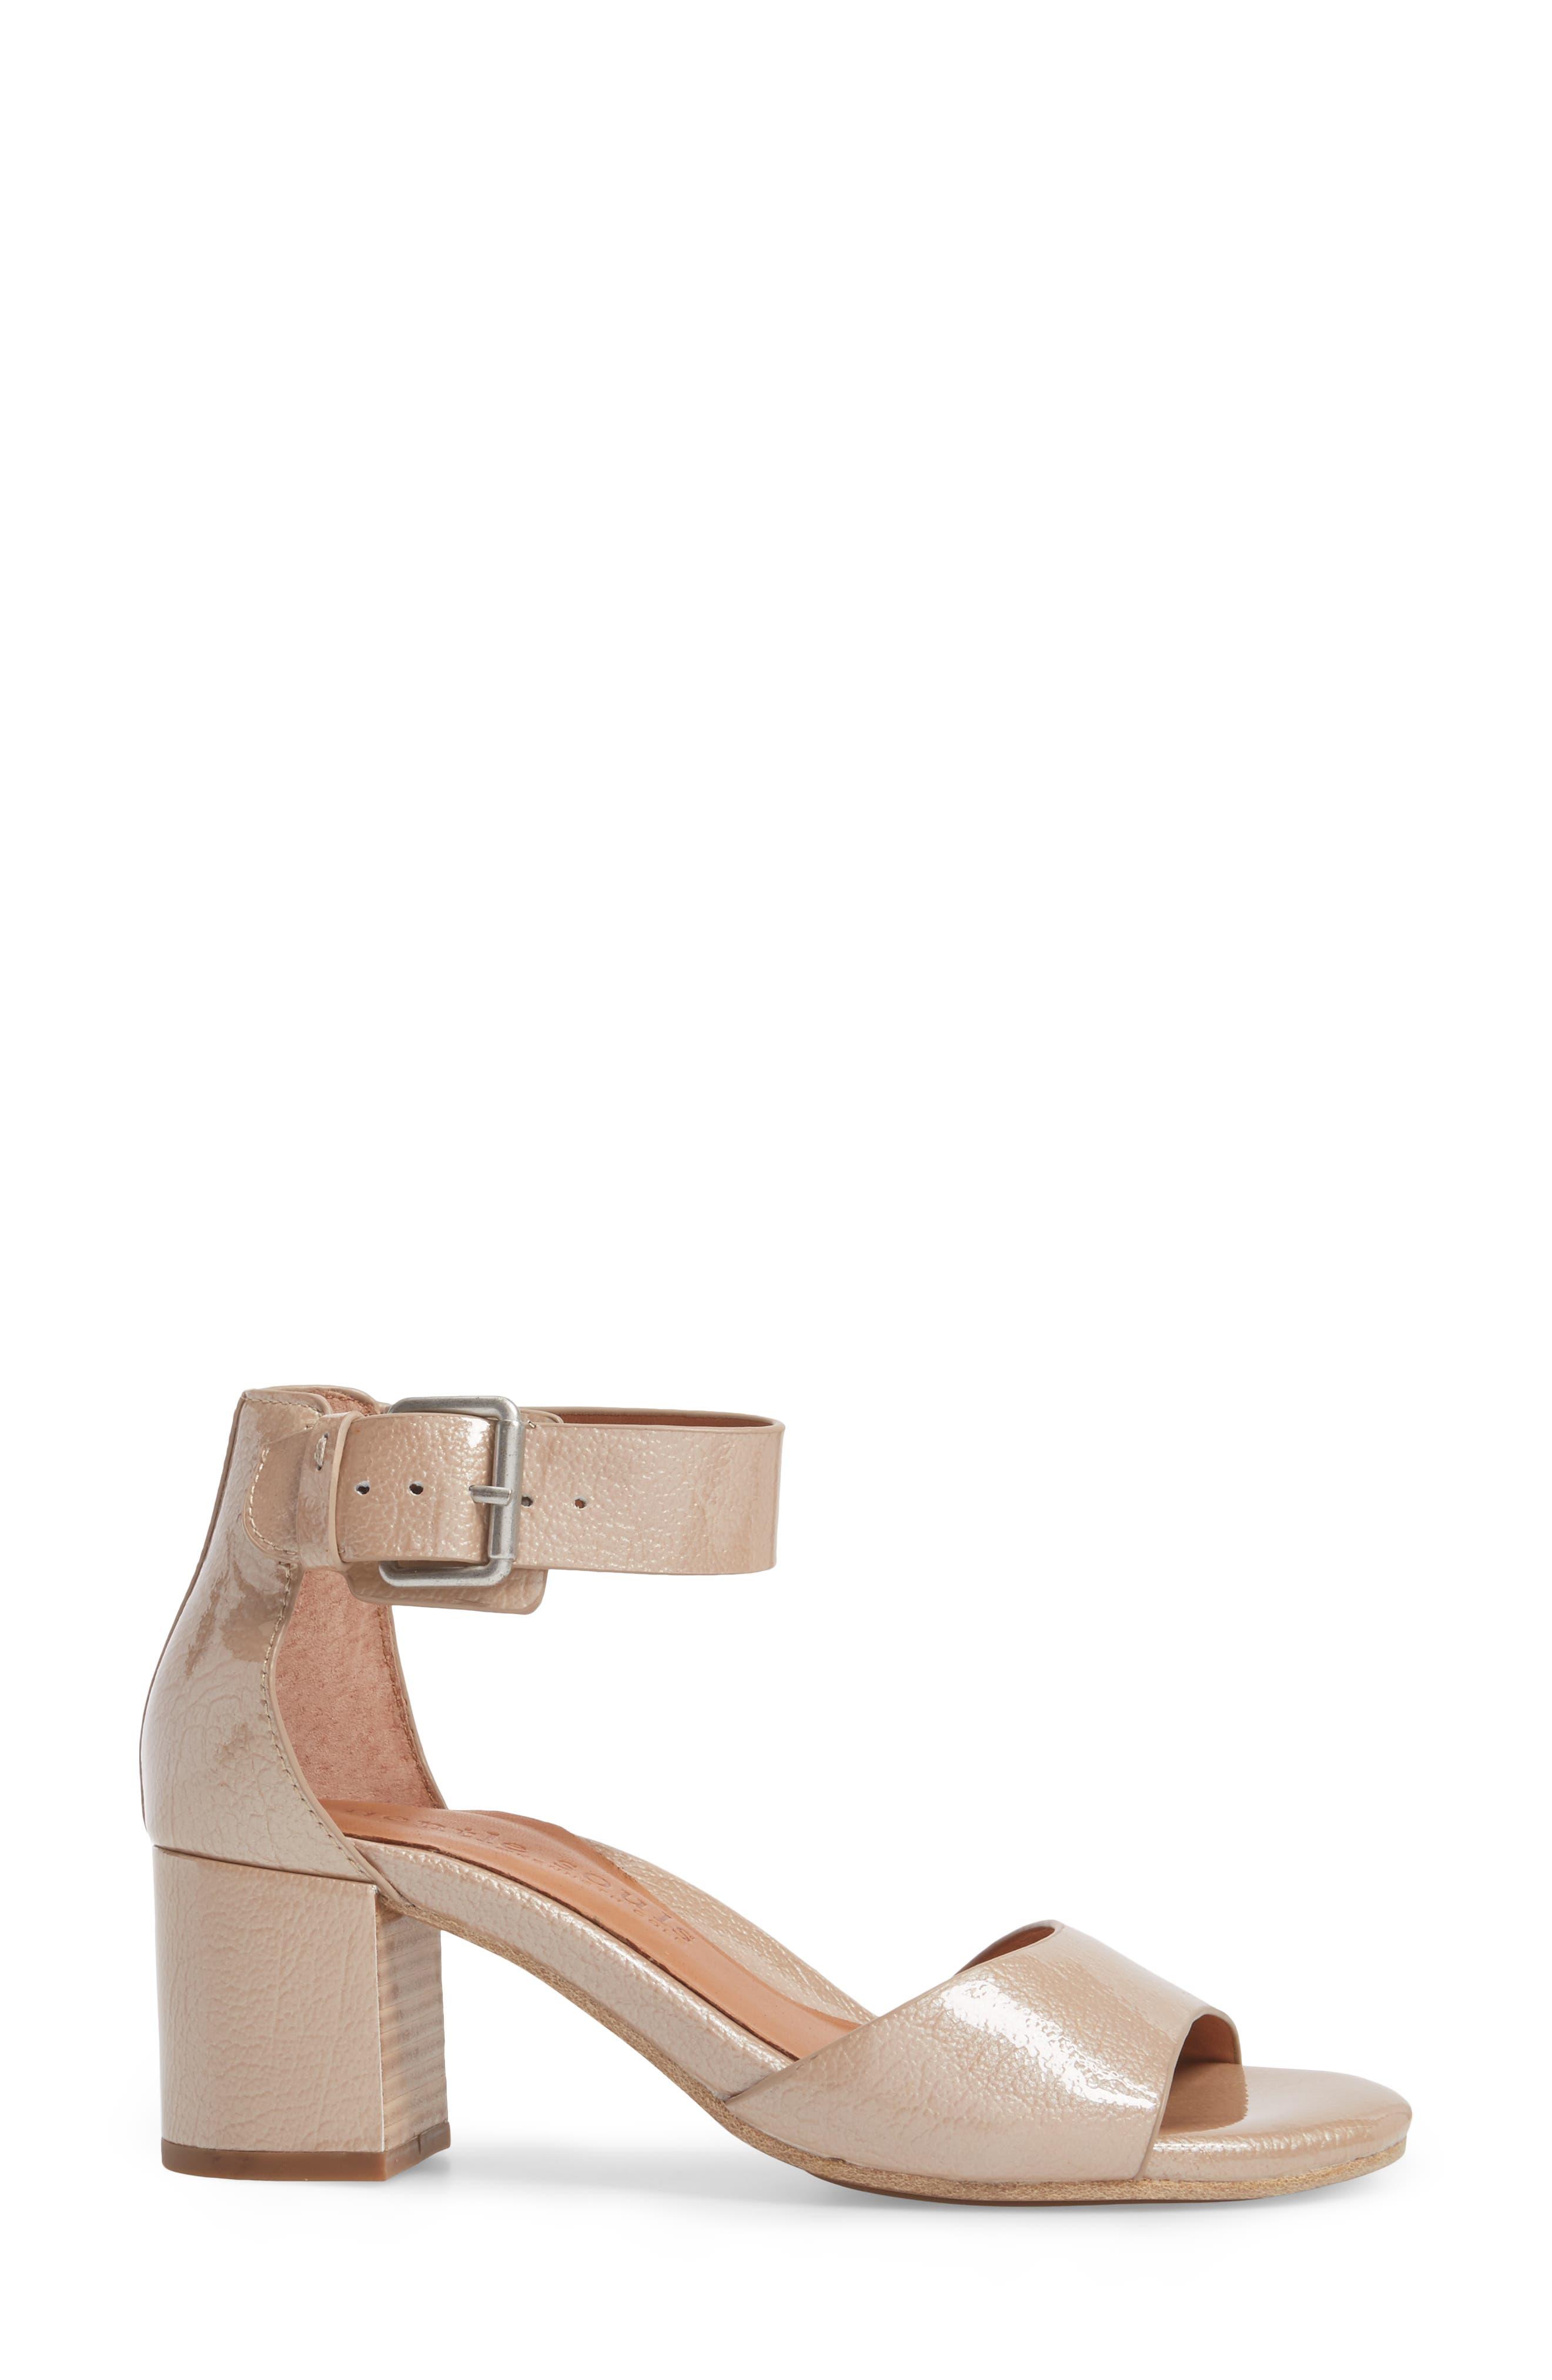 Christa Block Heel Sandal,                             Alternate thumbnail 3, color,                             NUDE PATENT LEATHER